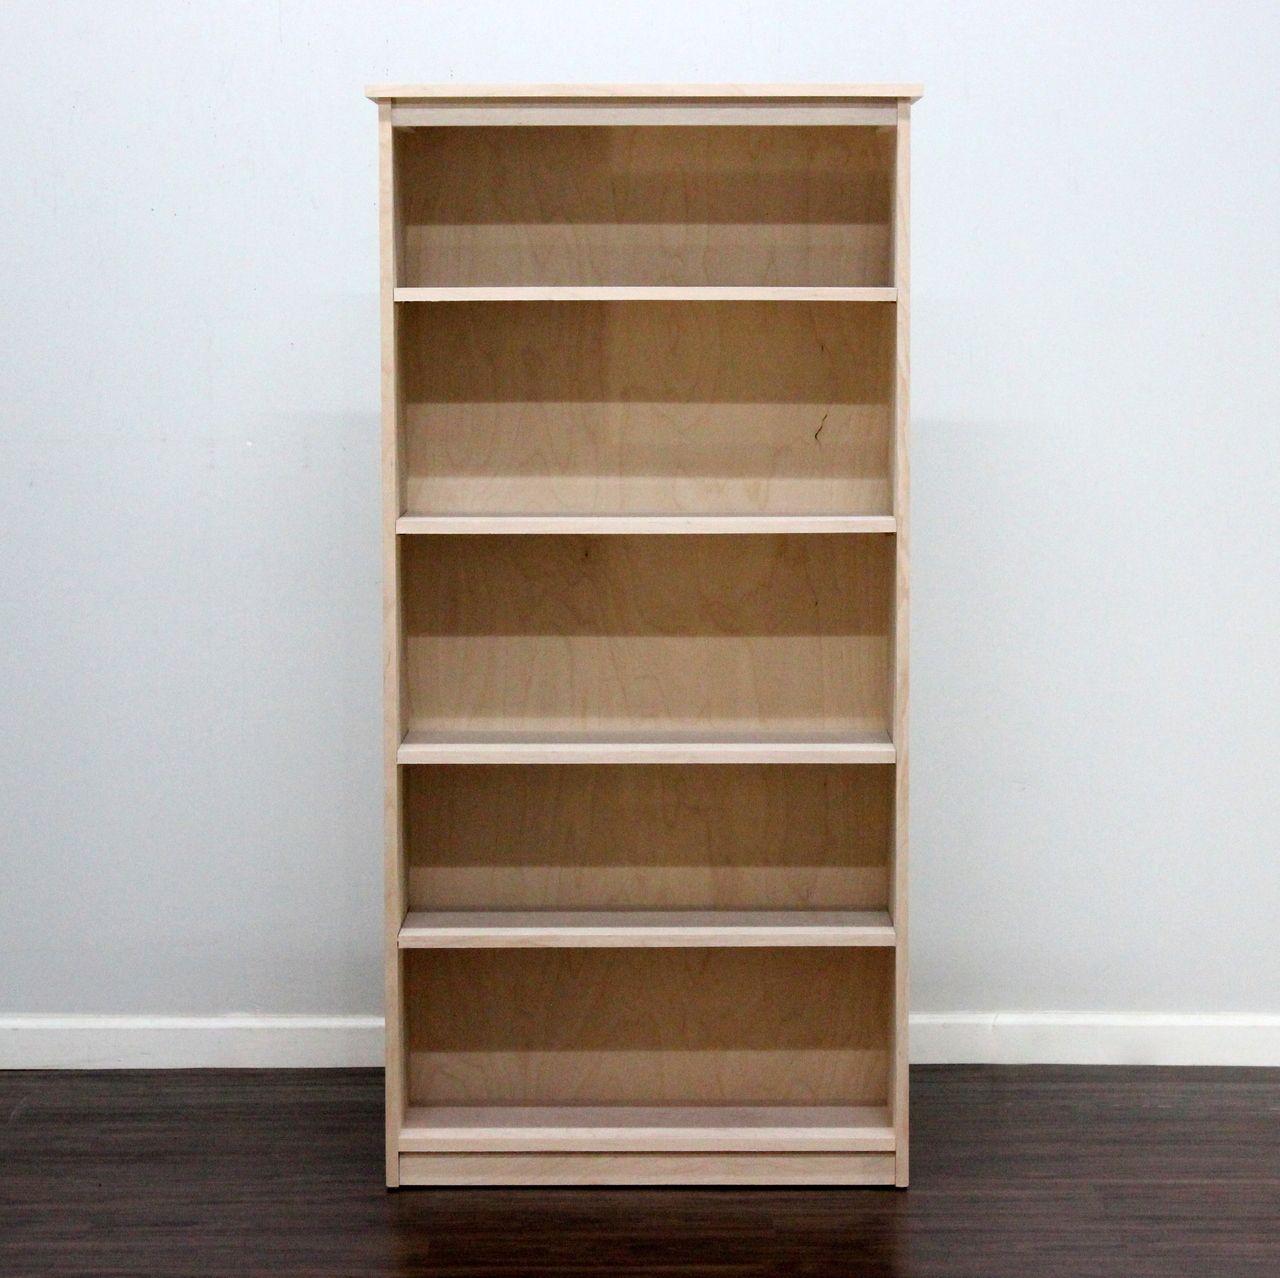 Lexington 12 X 30 X 60 Gothic Furniture Bookcase Cube Bookcase